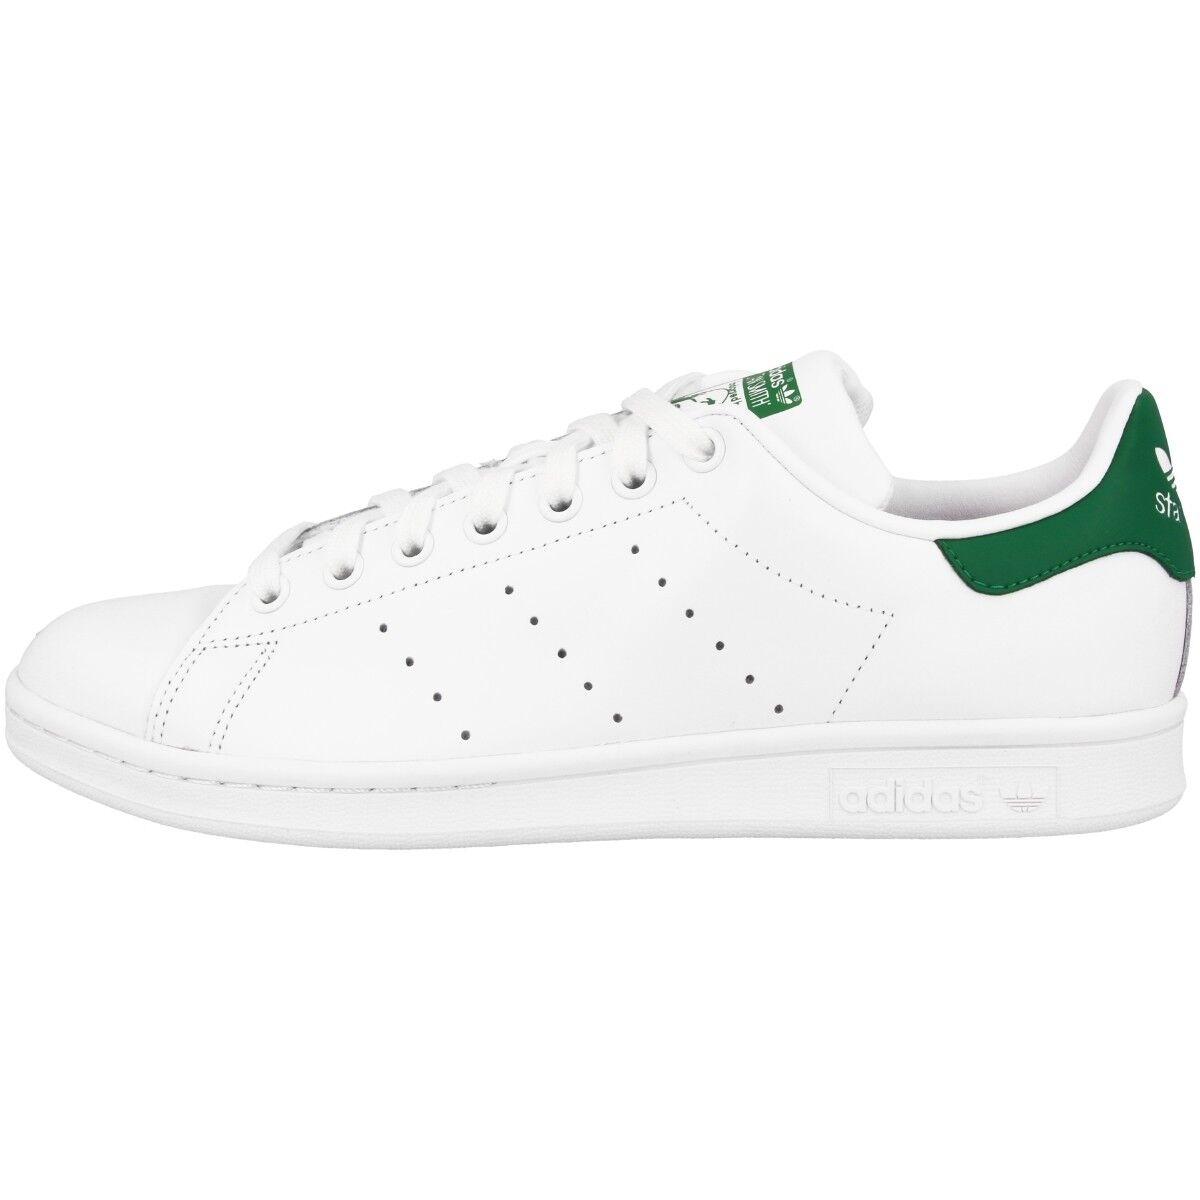 Zapatos promocionales para hombres y mujeres Adidas Stan Smith Schuhe Retro Sneaker white fairway M20324 Tennis Court Samba